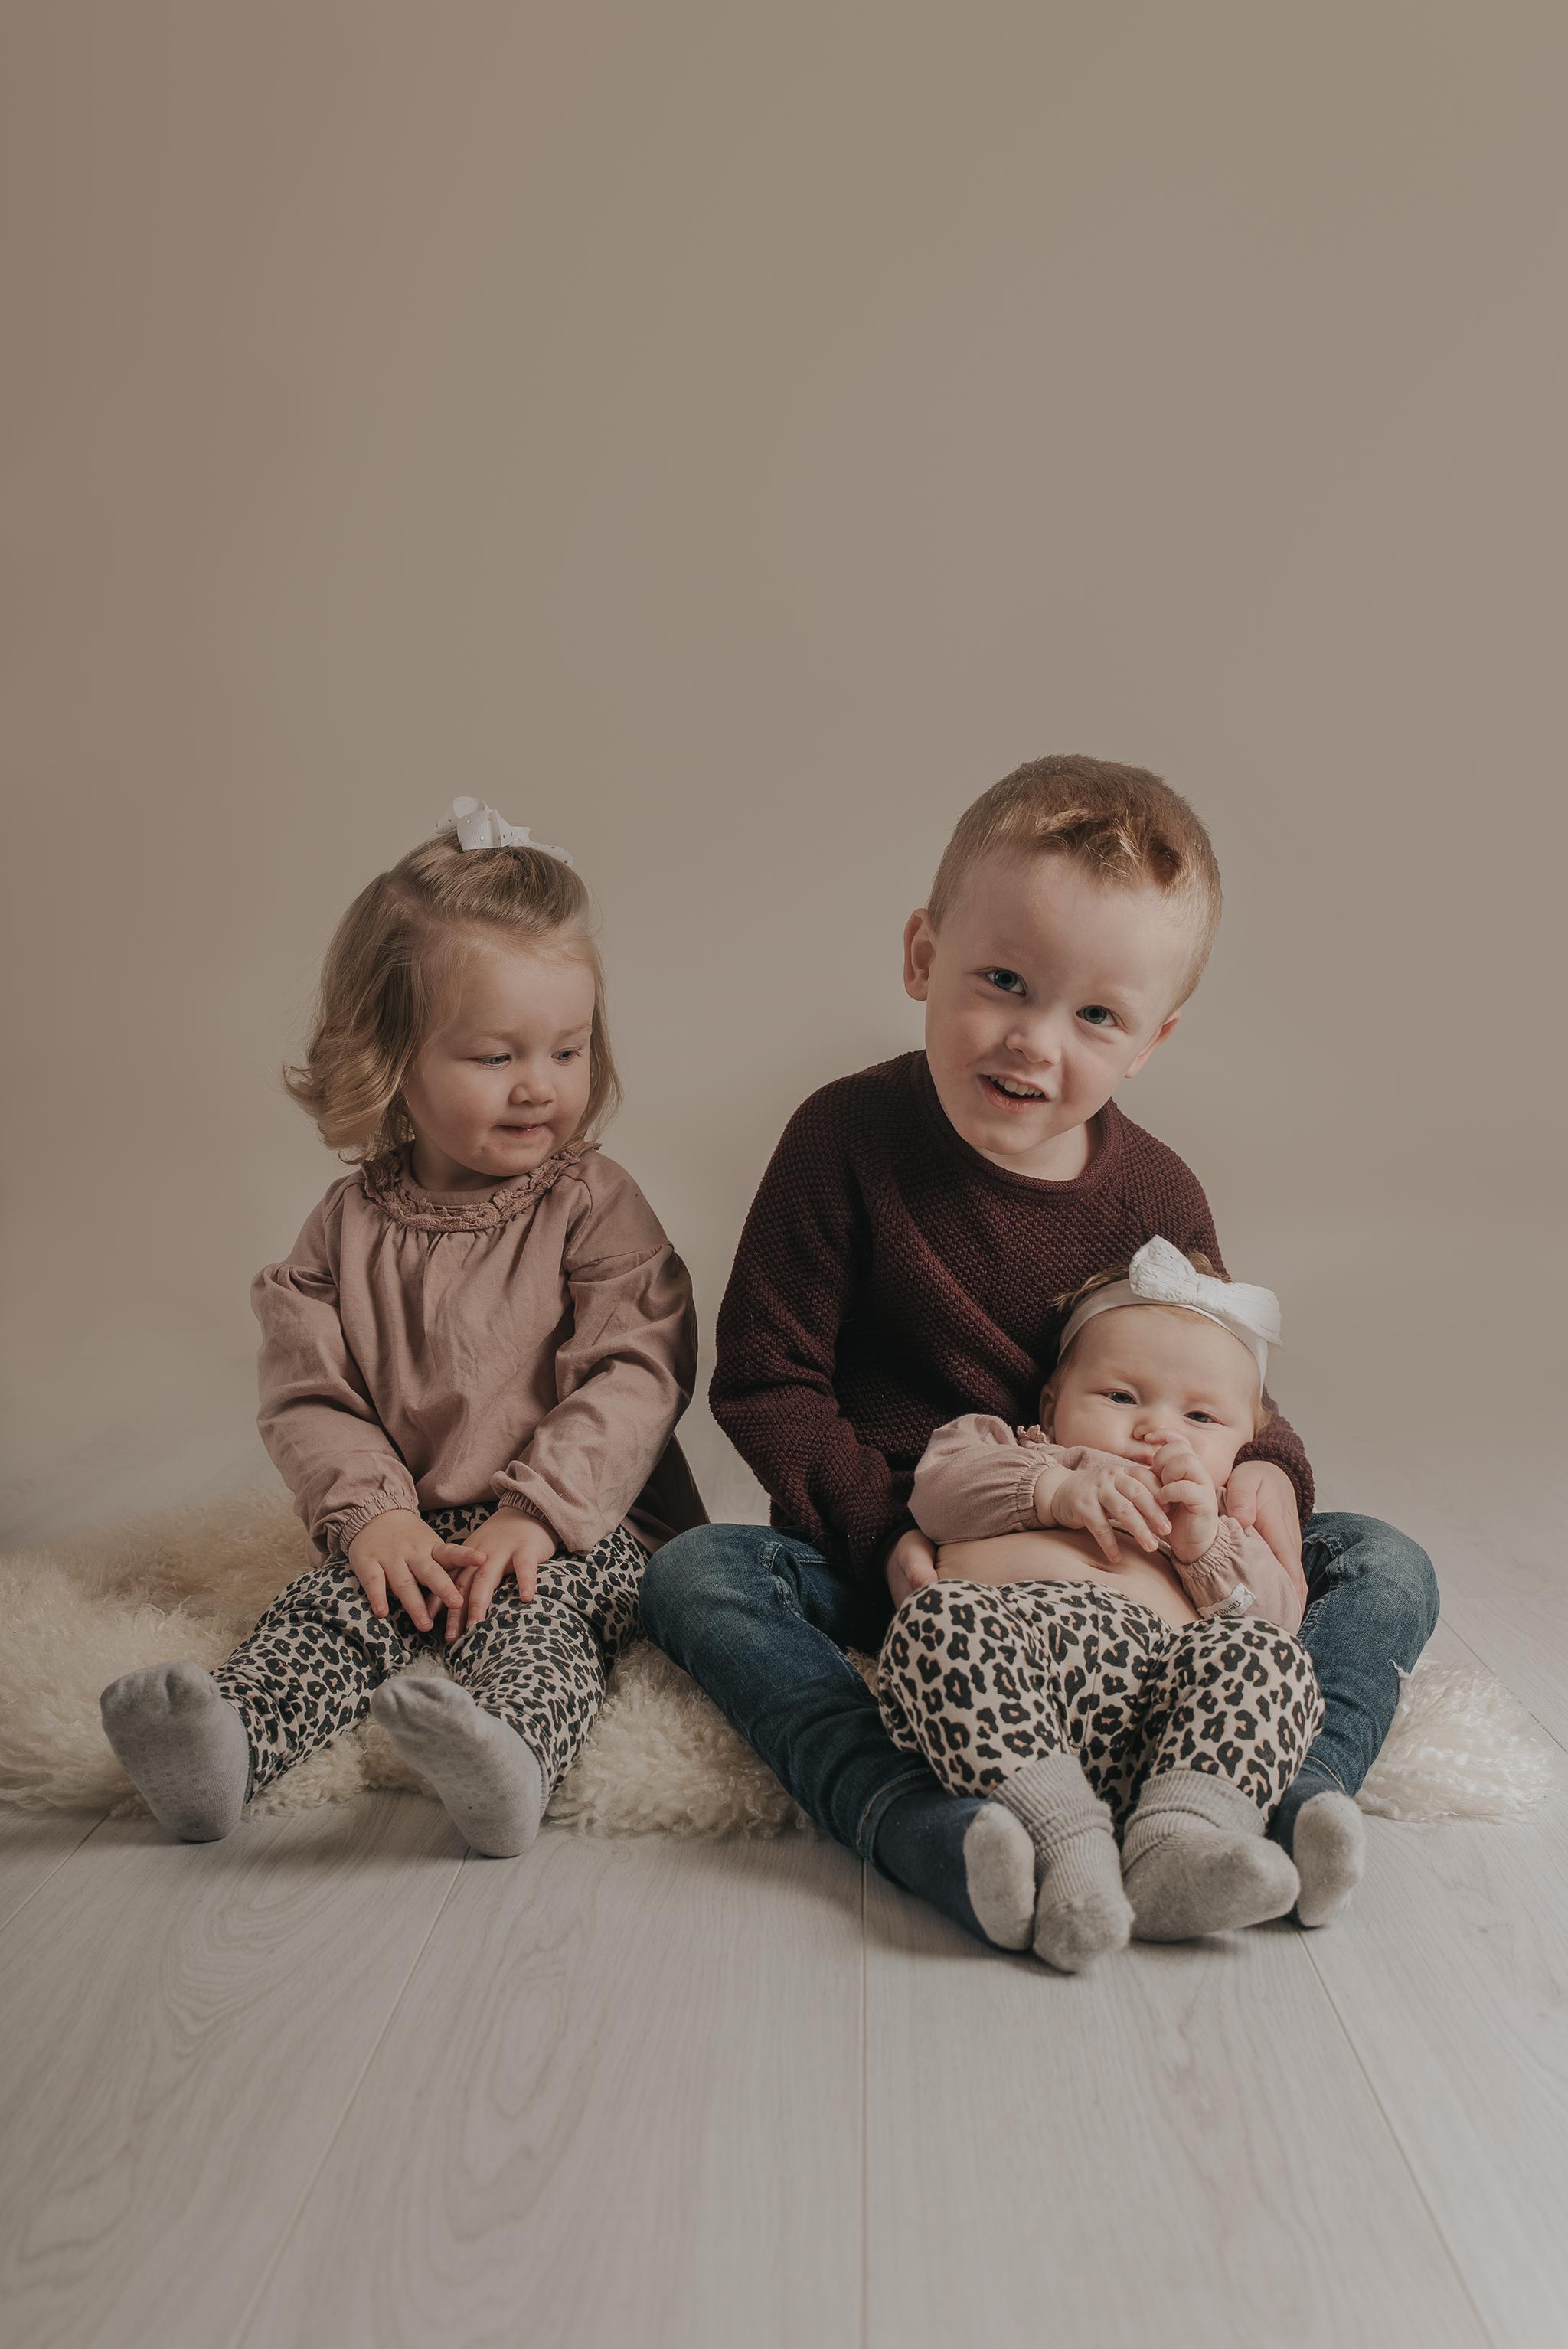 FamiljefotograferingFotograf Nathalie Nyberg webb 0005.jpg